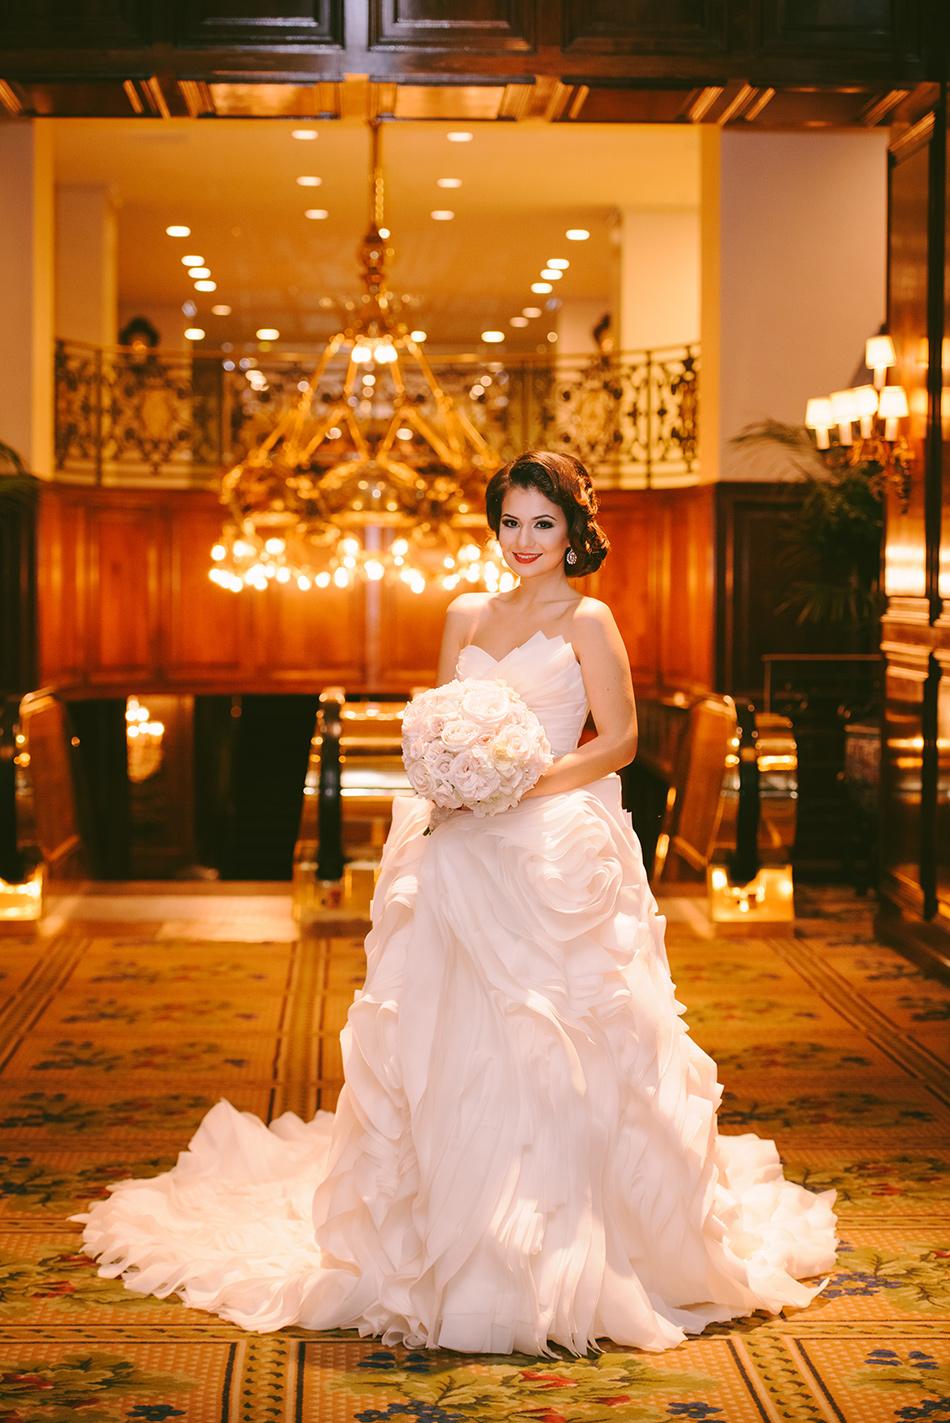 AD Passion Photography | stephany-and-nathan-wedding-dallas_045 | Adelin, Dida, fotograf profesionist, fotograf de nunta, fotografie de nunta, fotograf Timisoara, fotograf Craiova, fotograf Bucuresti, fotograf Arad, nunta Timisoara, nunta Arad, nunta Bucuresti, nunta Craiova